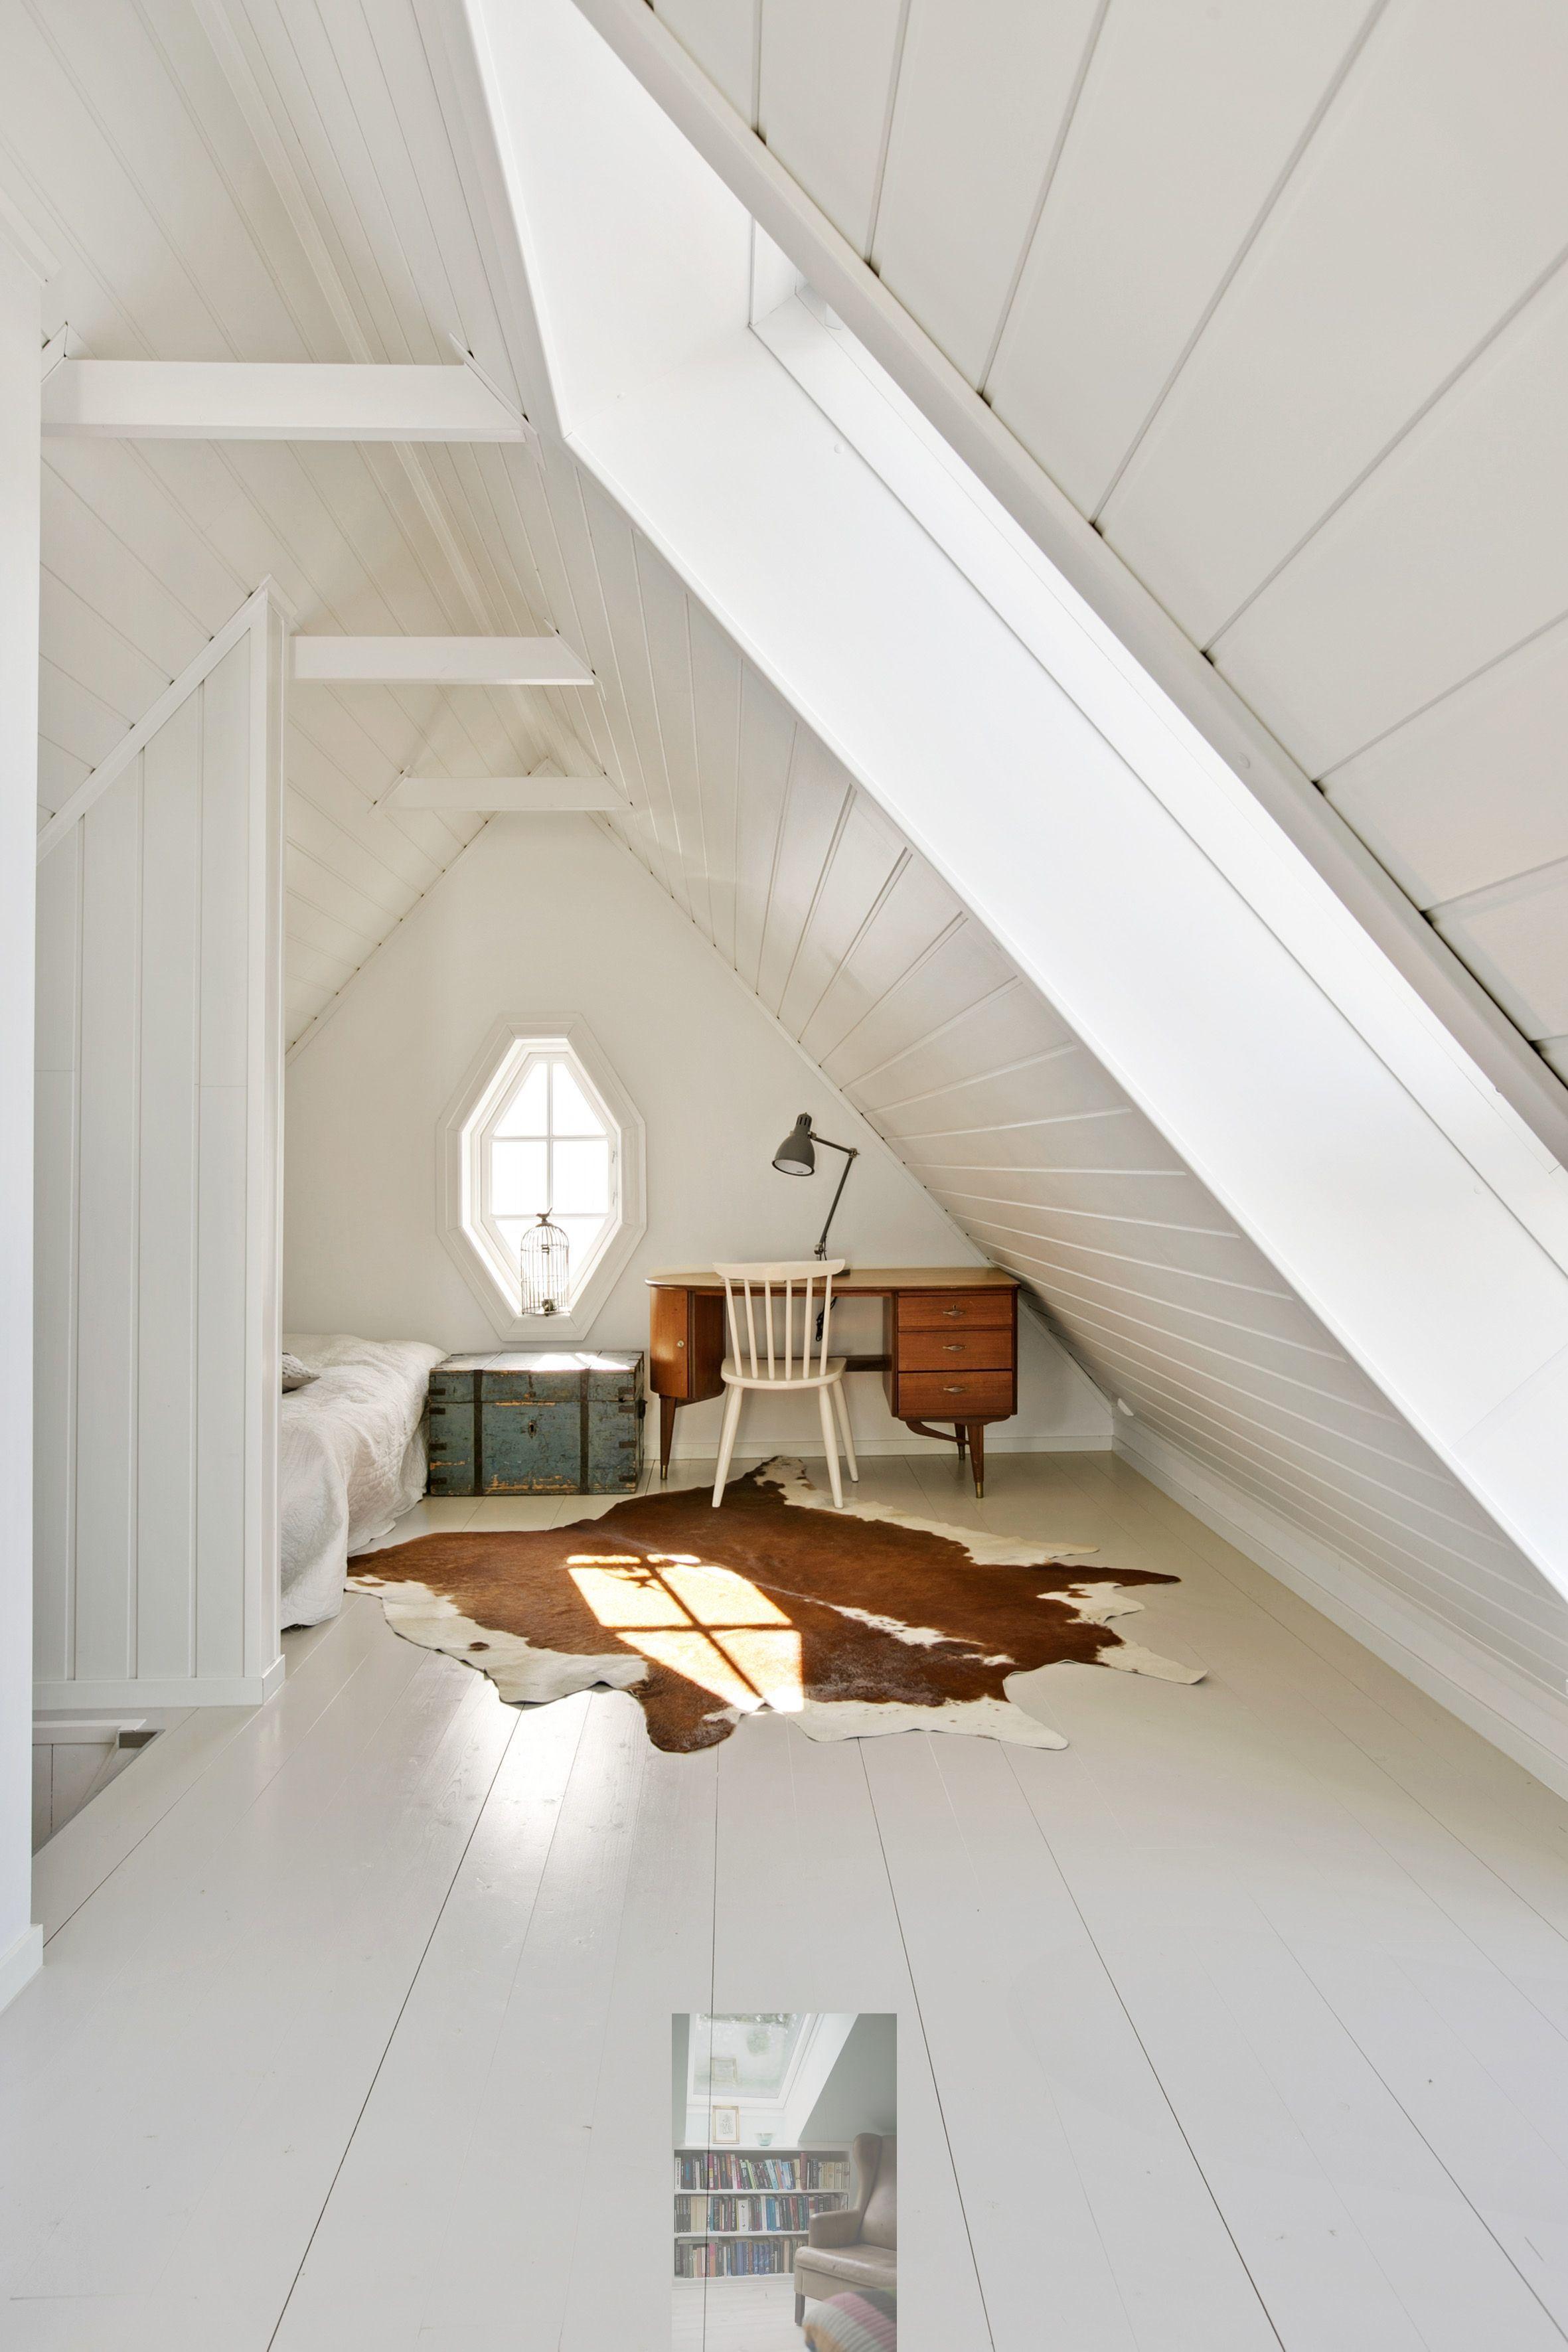 15 Inexpensive Attic Rooms Living Area Ideas Attic Bedroom Small Attic Rooms Attic Remodel